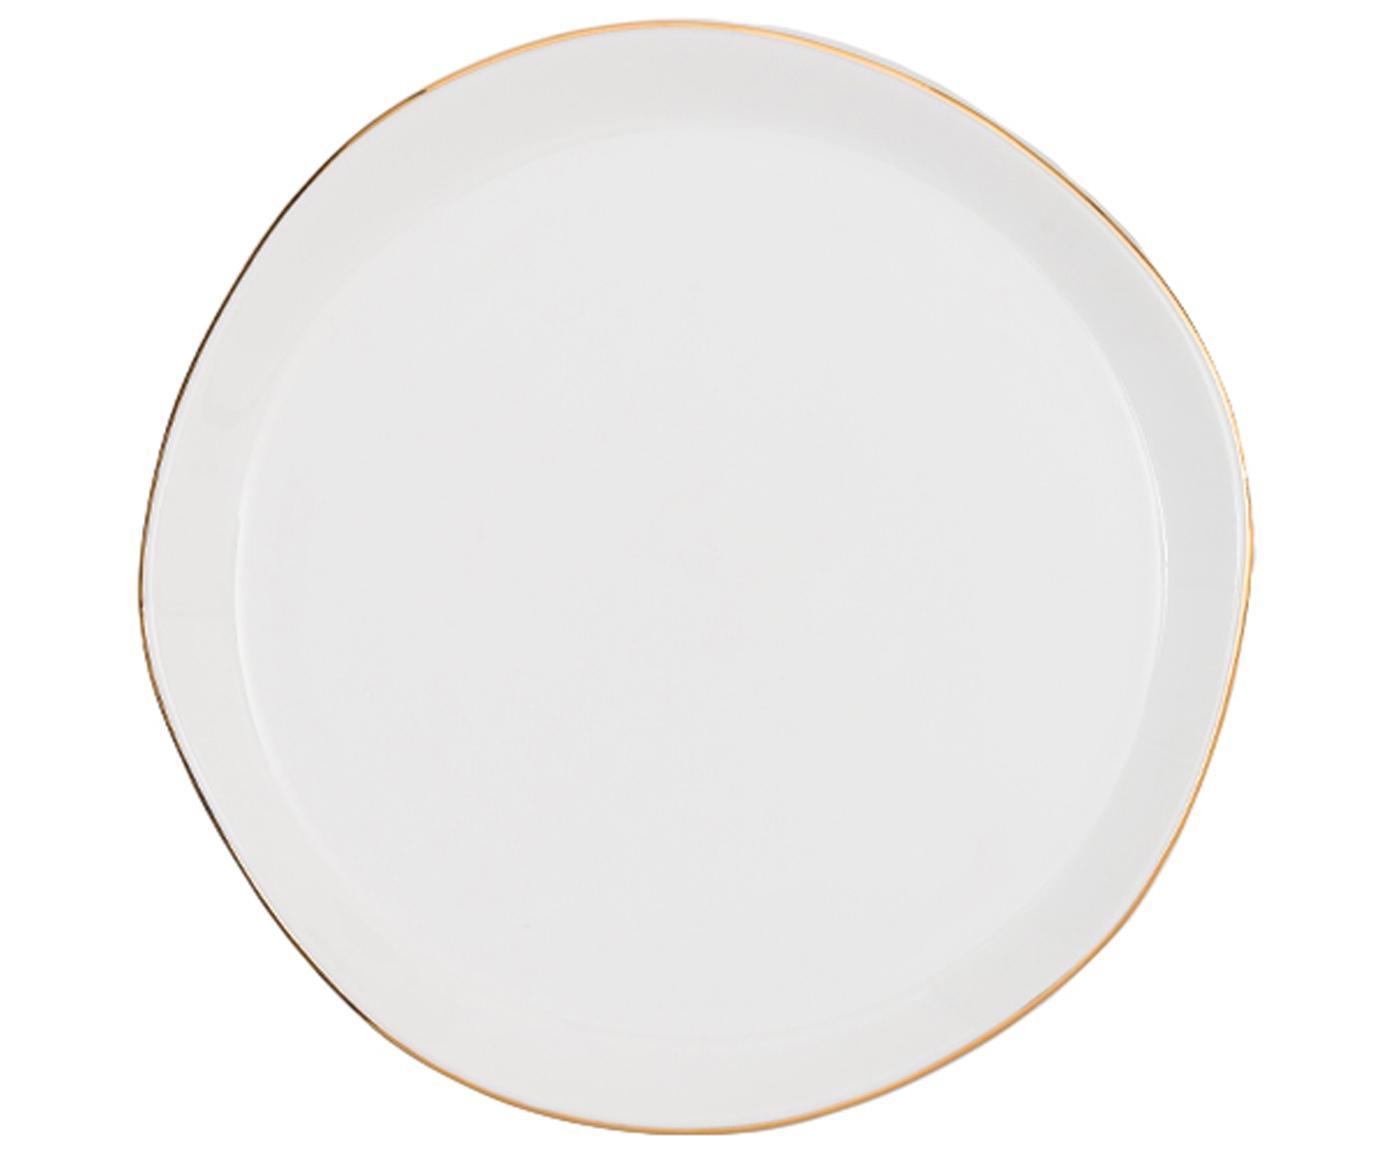 Ontbijtbord Good Morning, Porselein, Wit, goudkleurig, Ø 17 cm